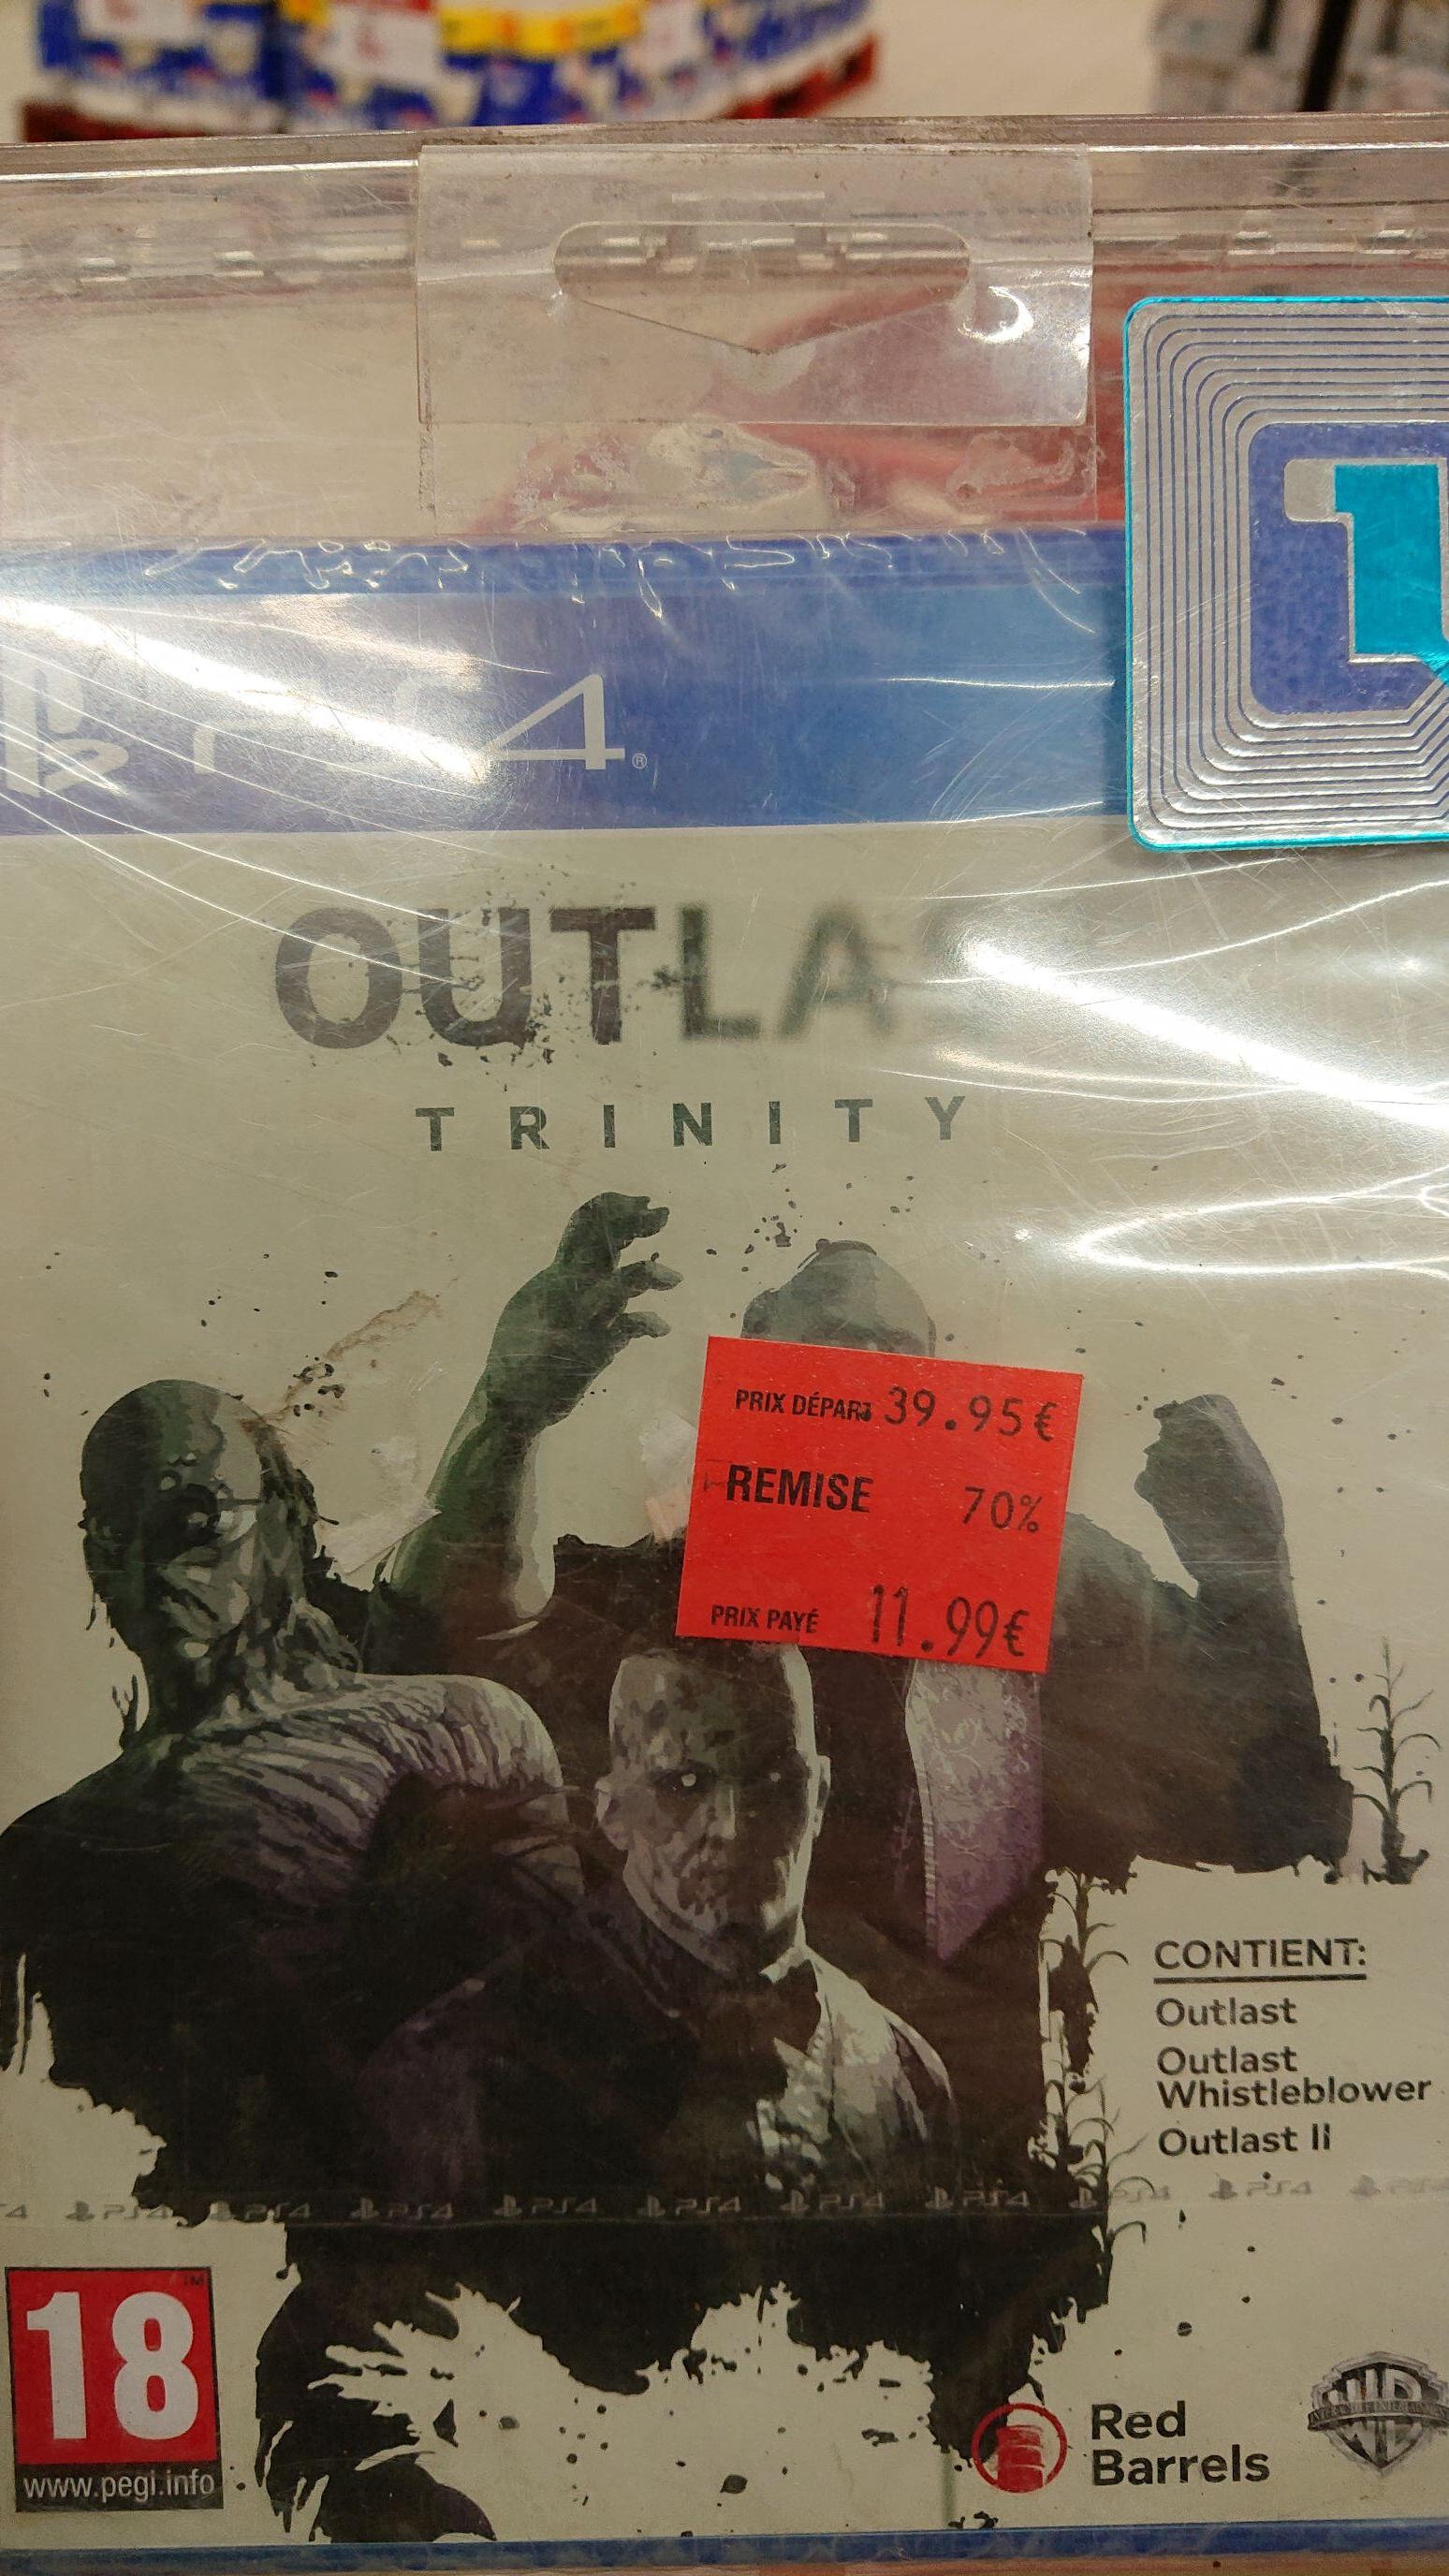 Outlast: Trinity sur PS4 - Chelles (77)